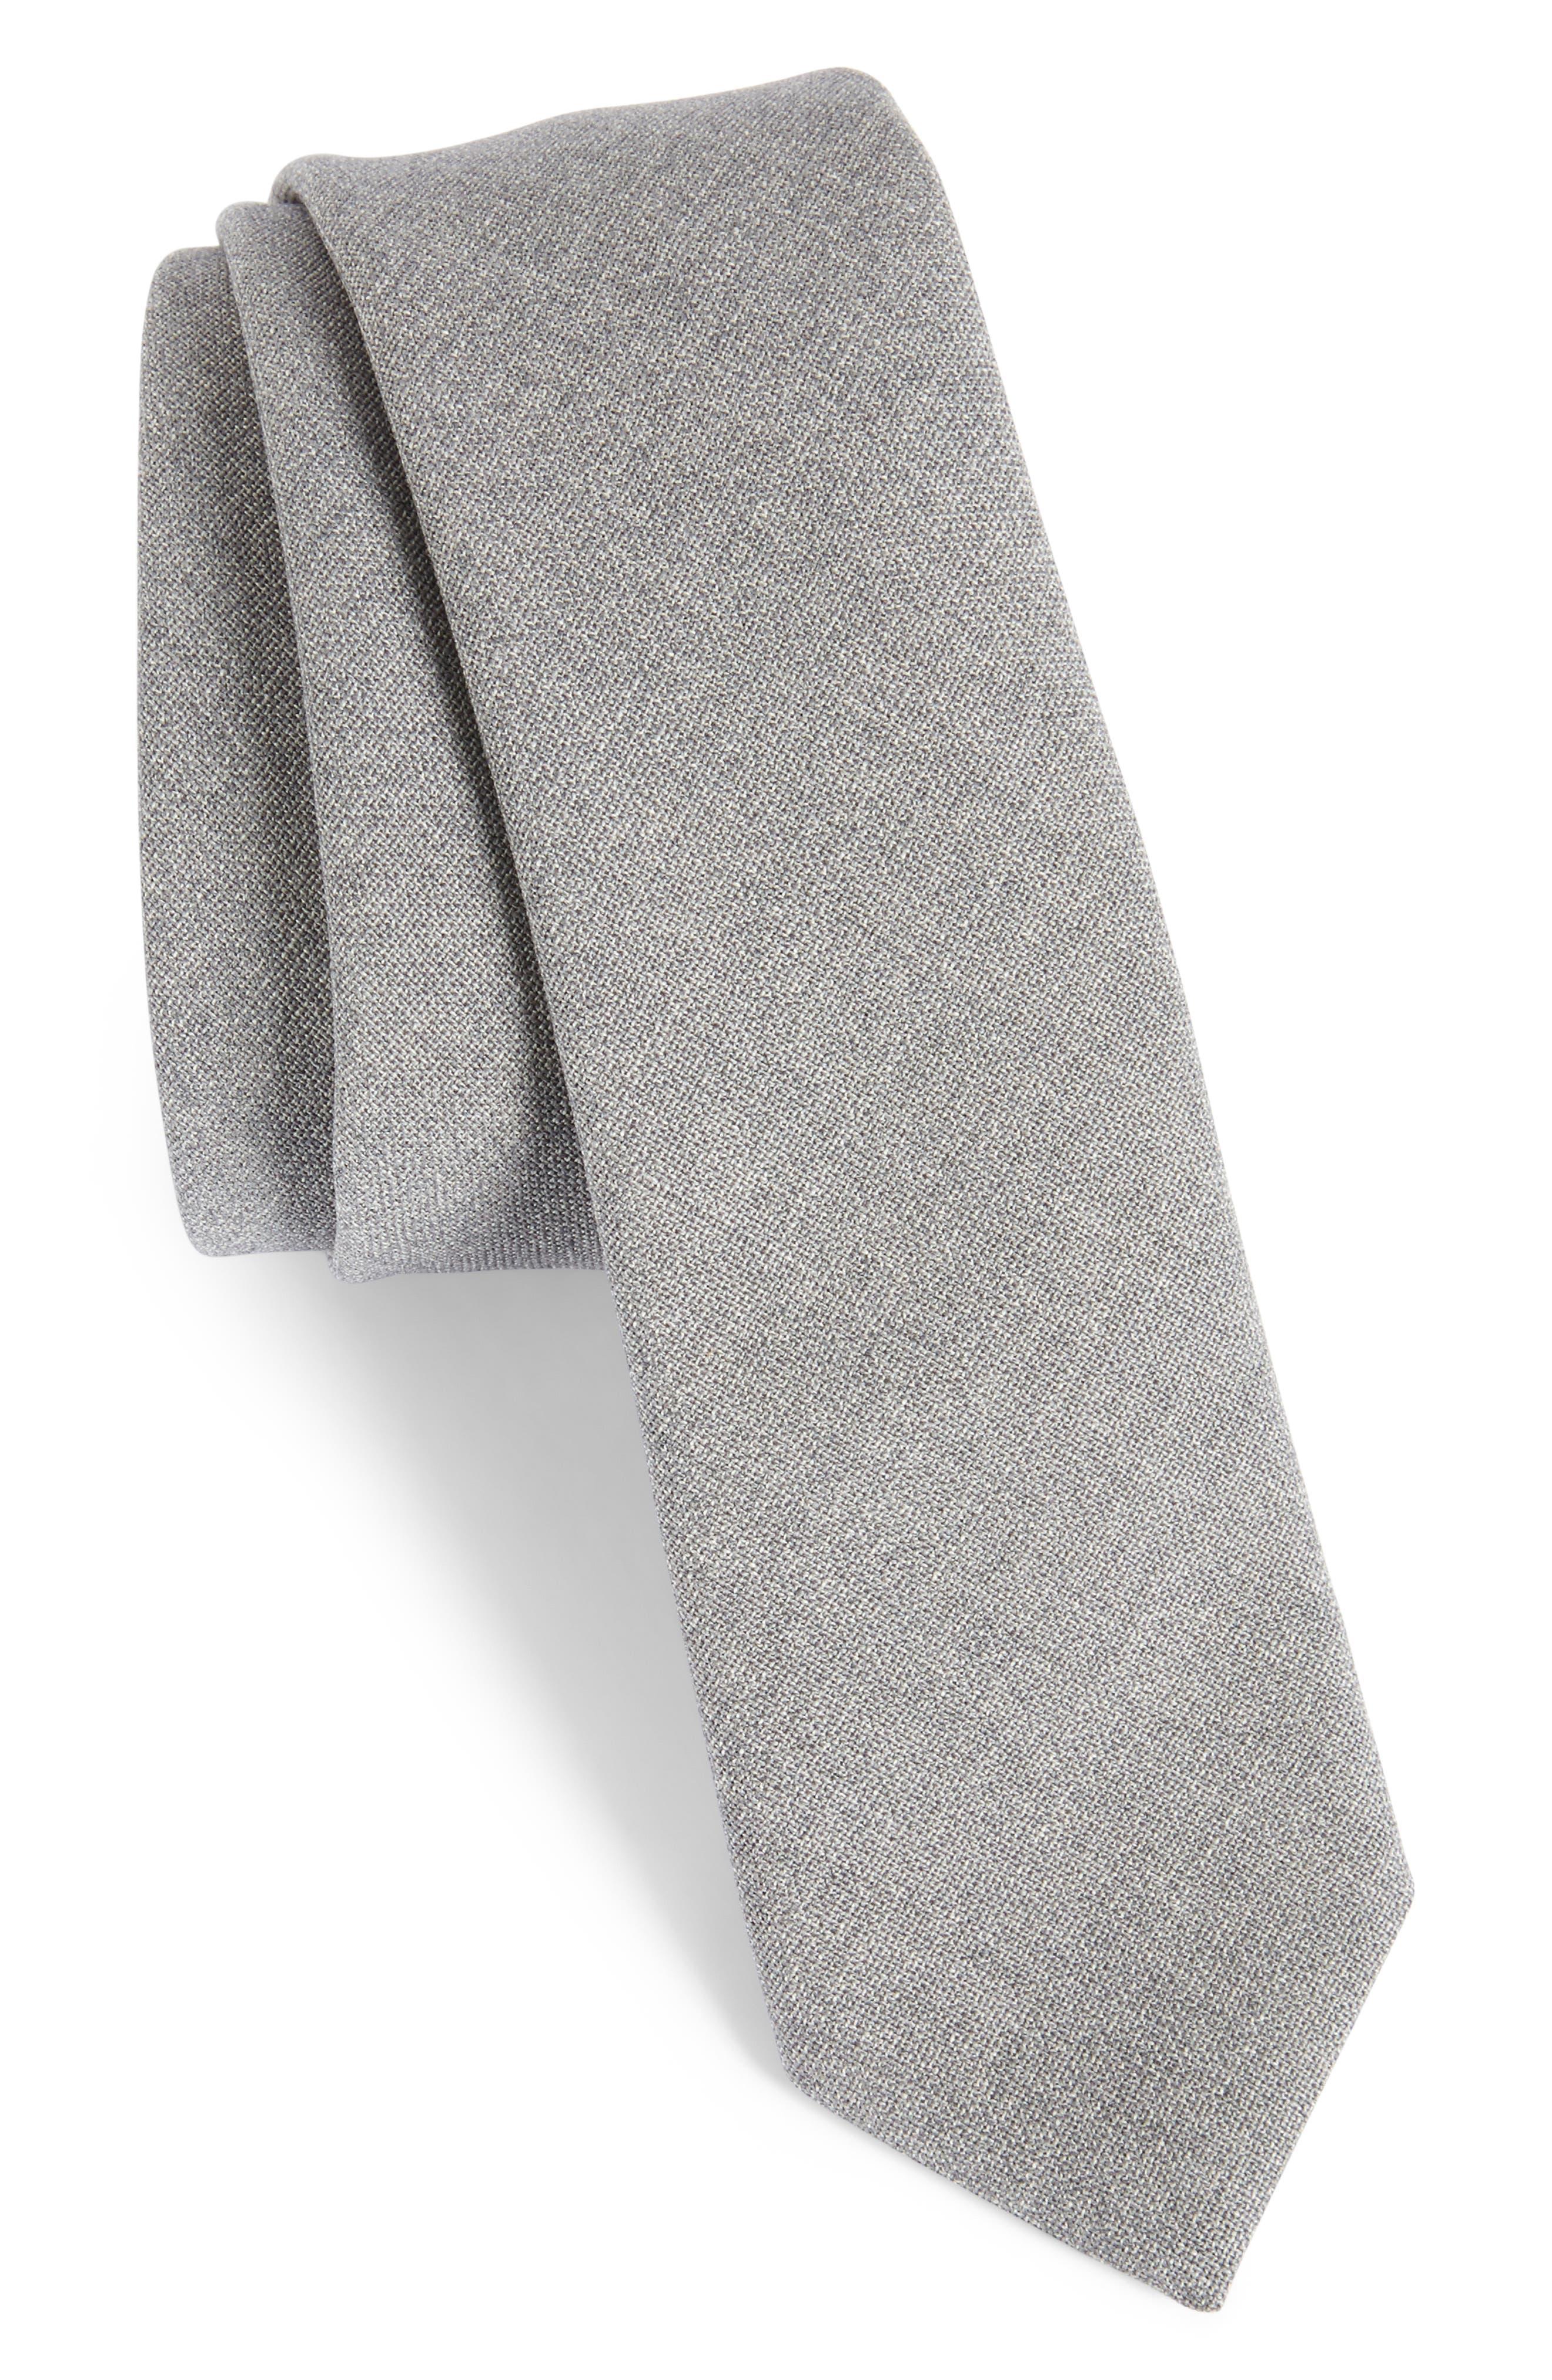 Jaspé Wool Skinny Tie,                             Main thumbnail 1, color,                             Pearl Grey